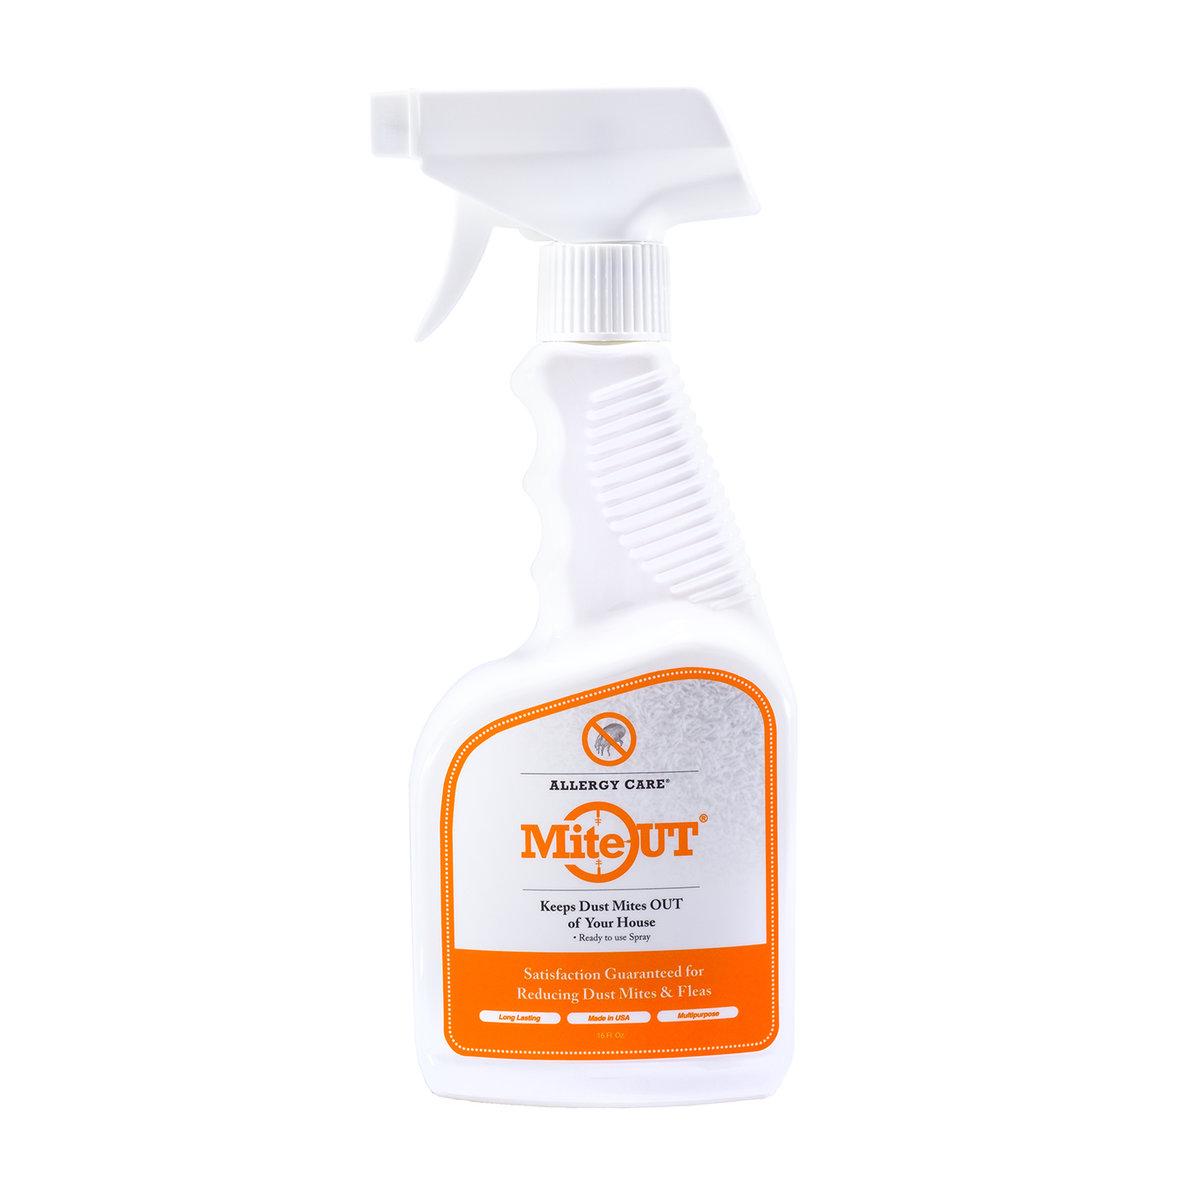 MiteOut Dust Mite Control Spray -16oz